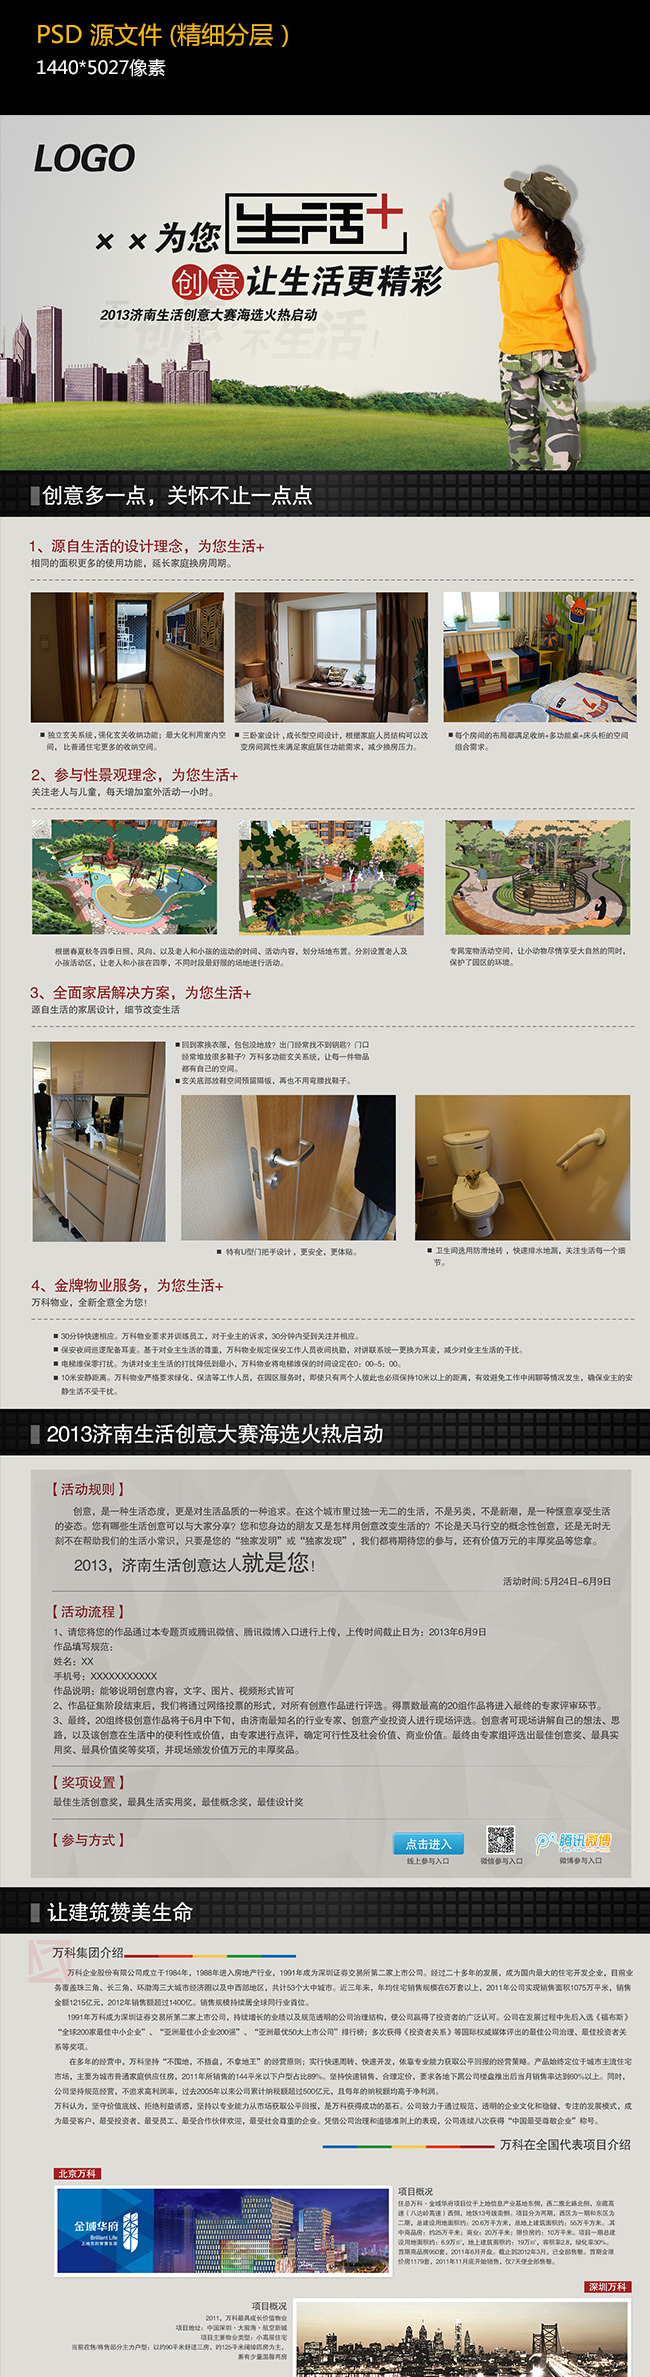 房地产网页设计-网站banner|网站广告条-网页设计模板